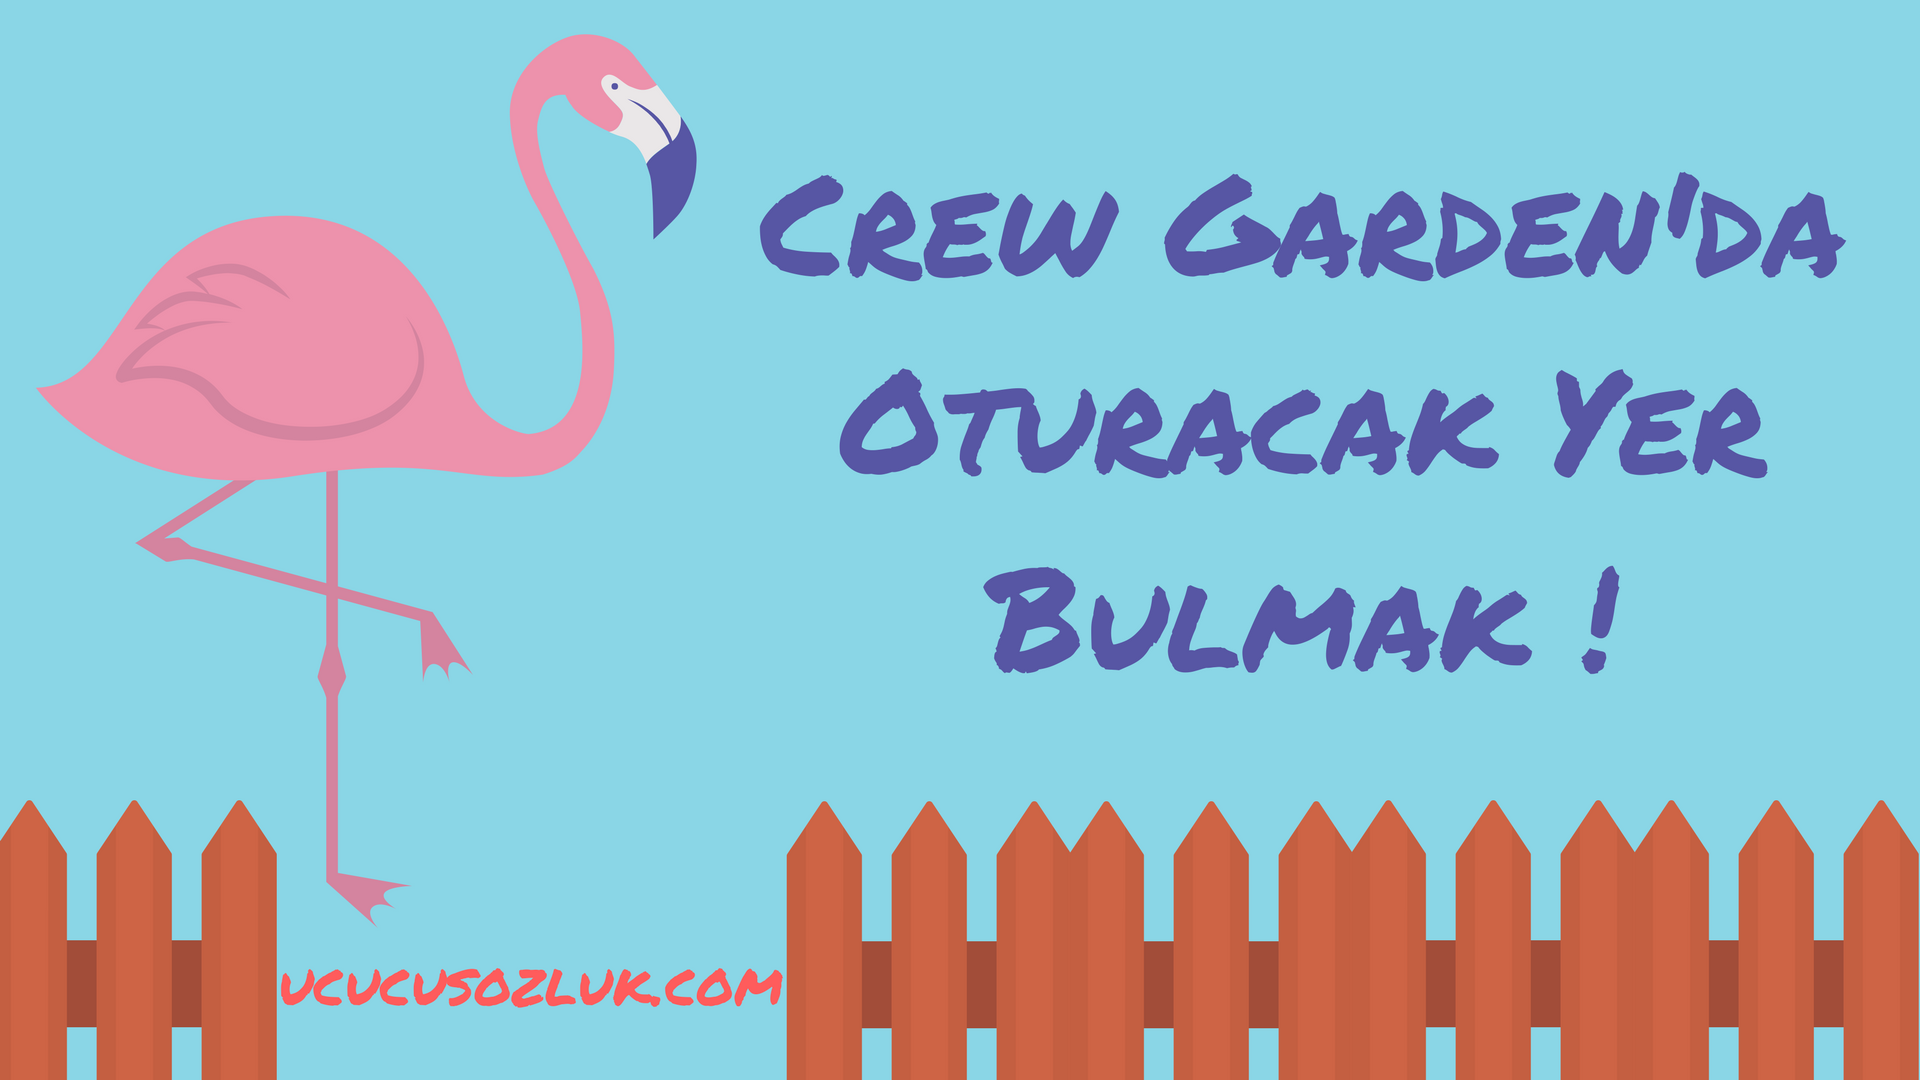 Crew Garden